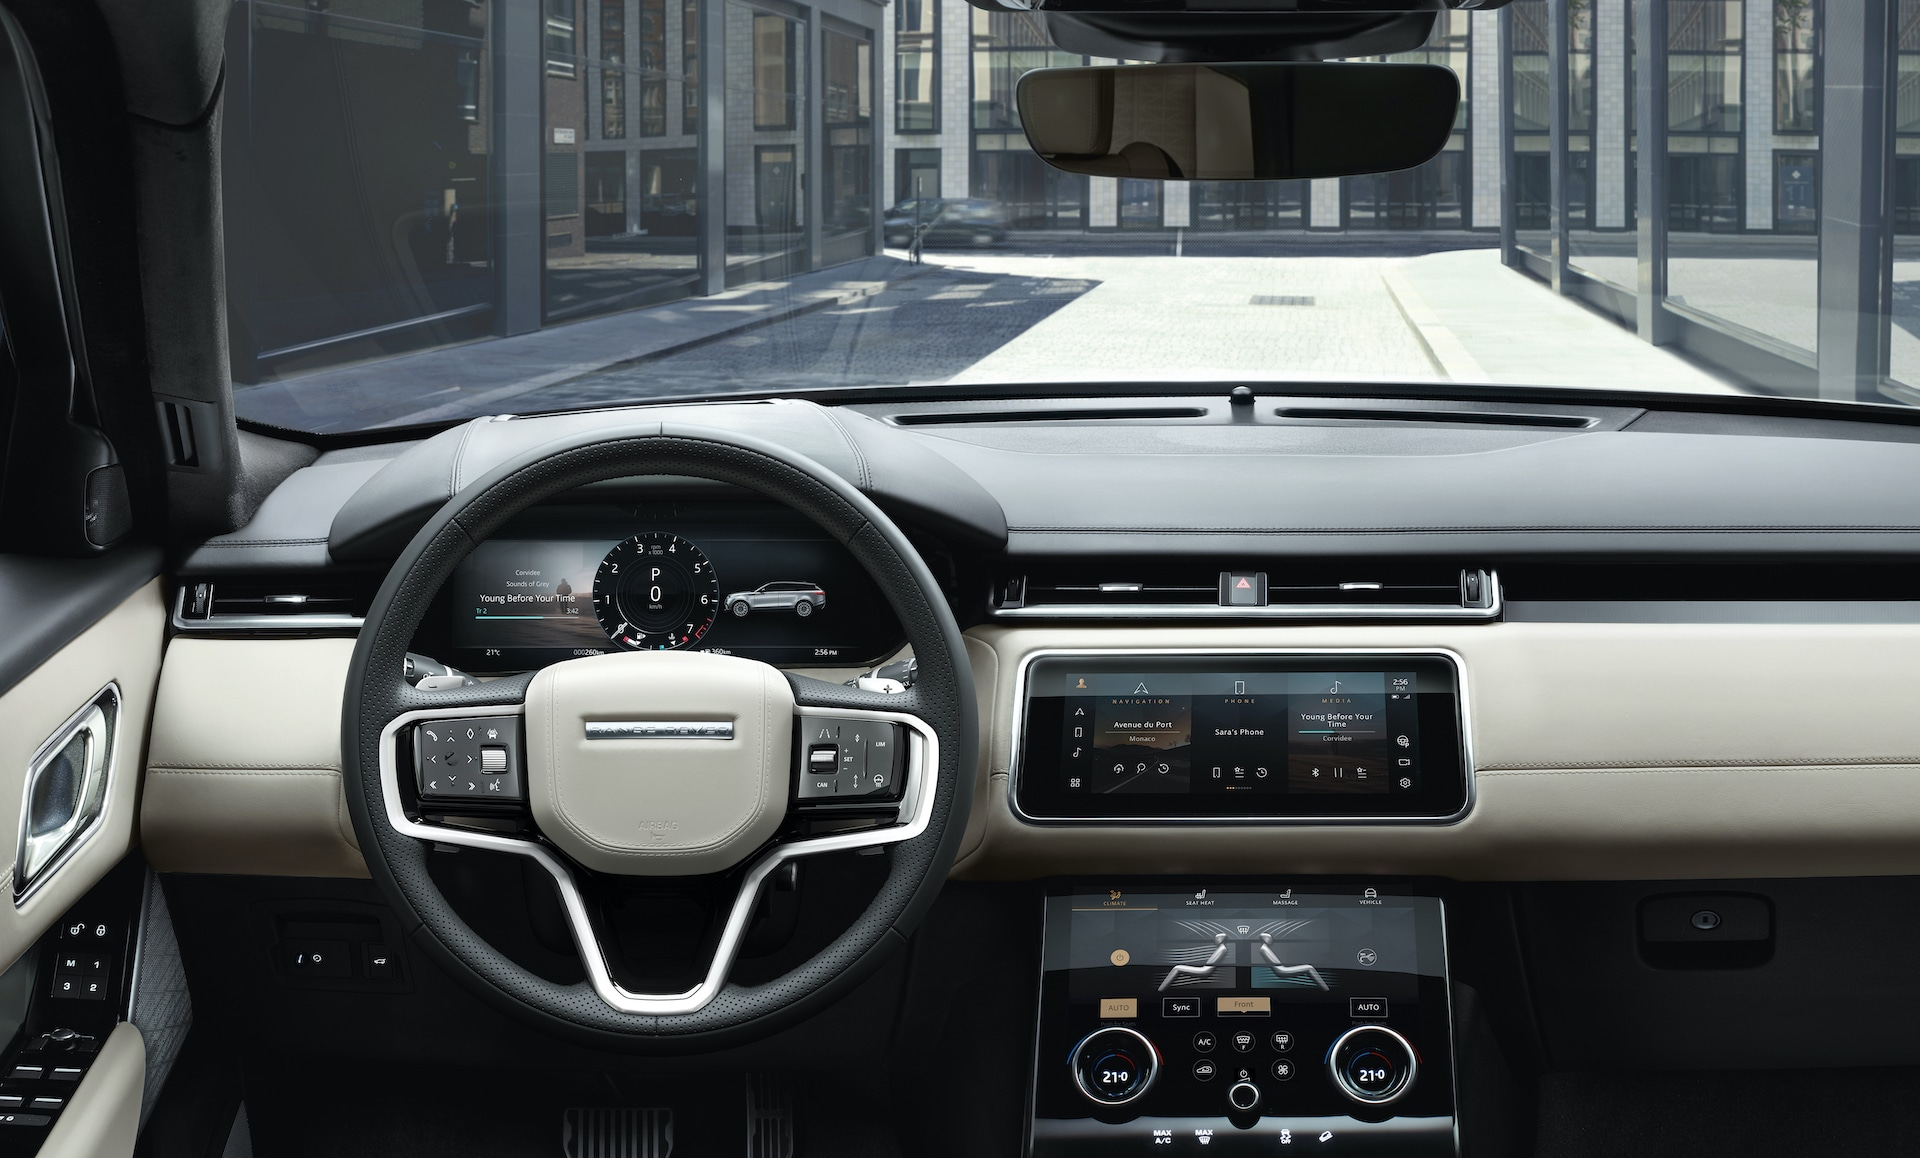 Range-Rover-Velar-Plug-in-Hybrid-Cockpit